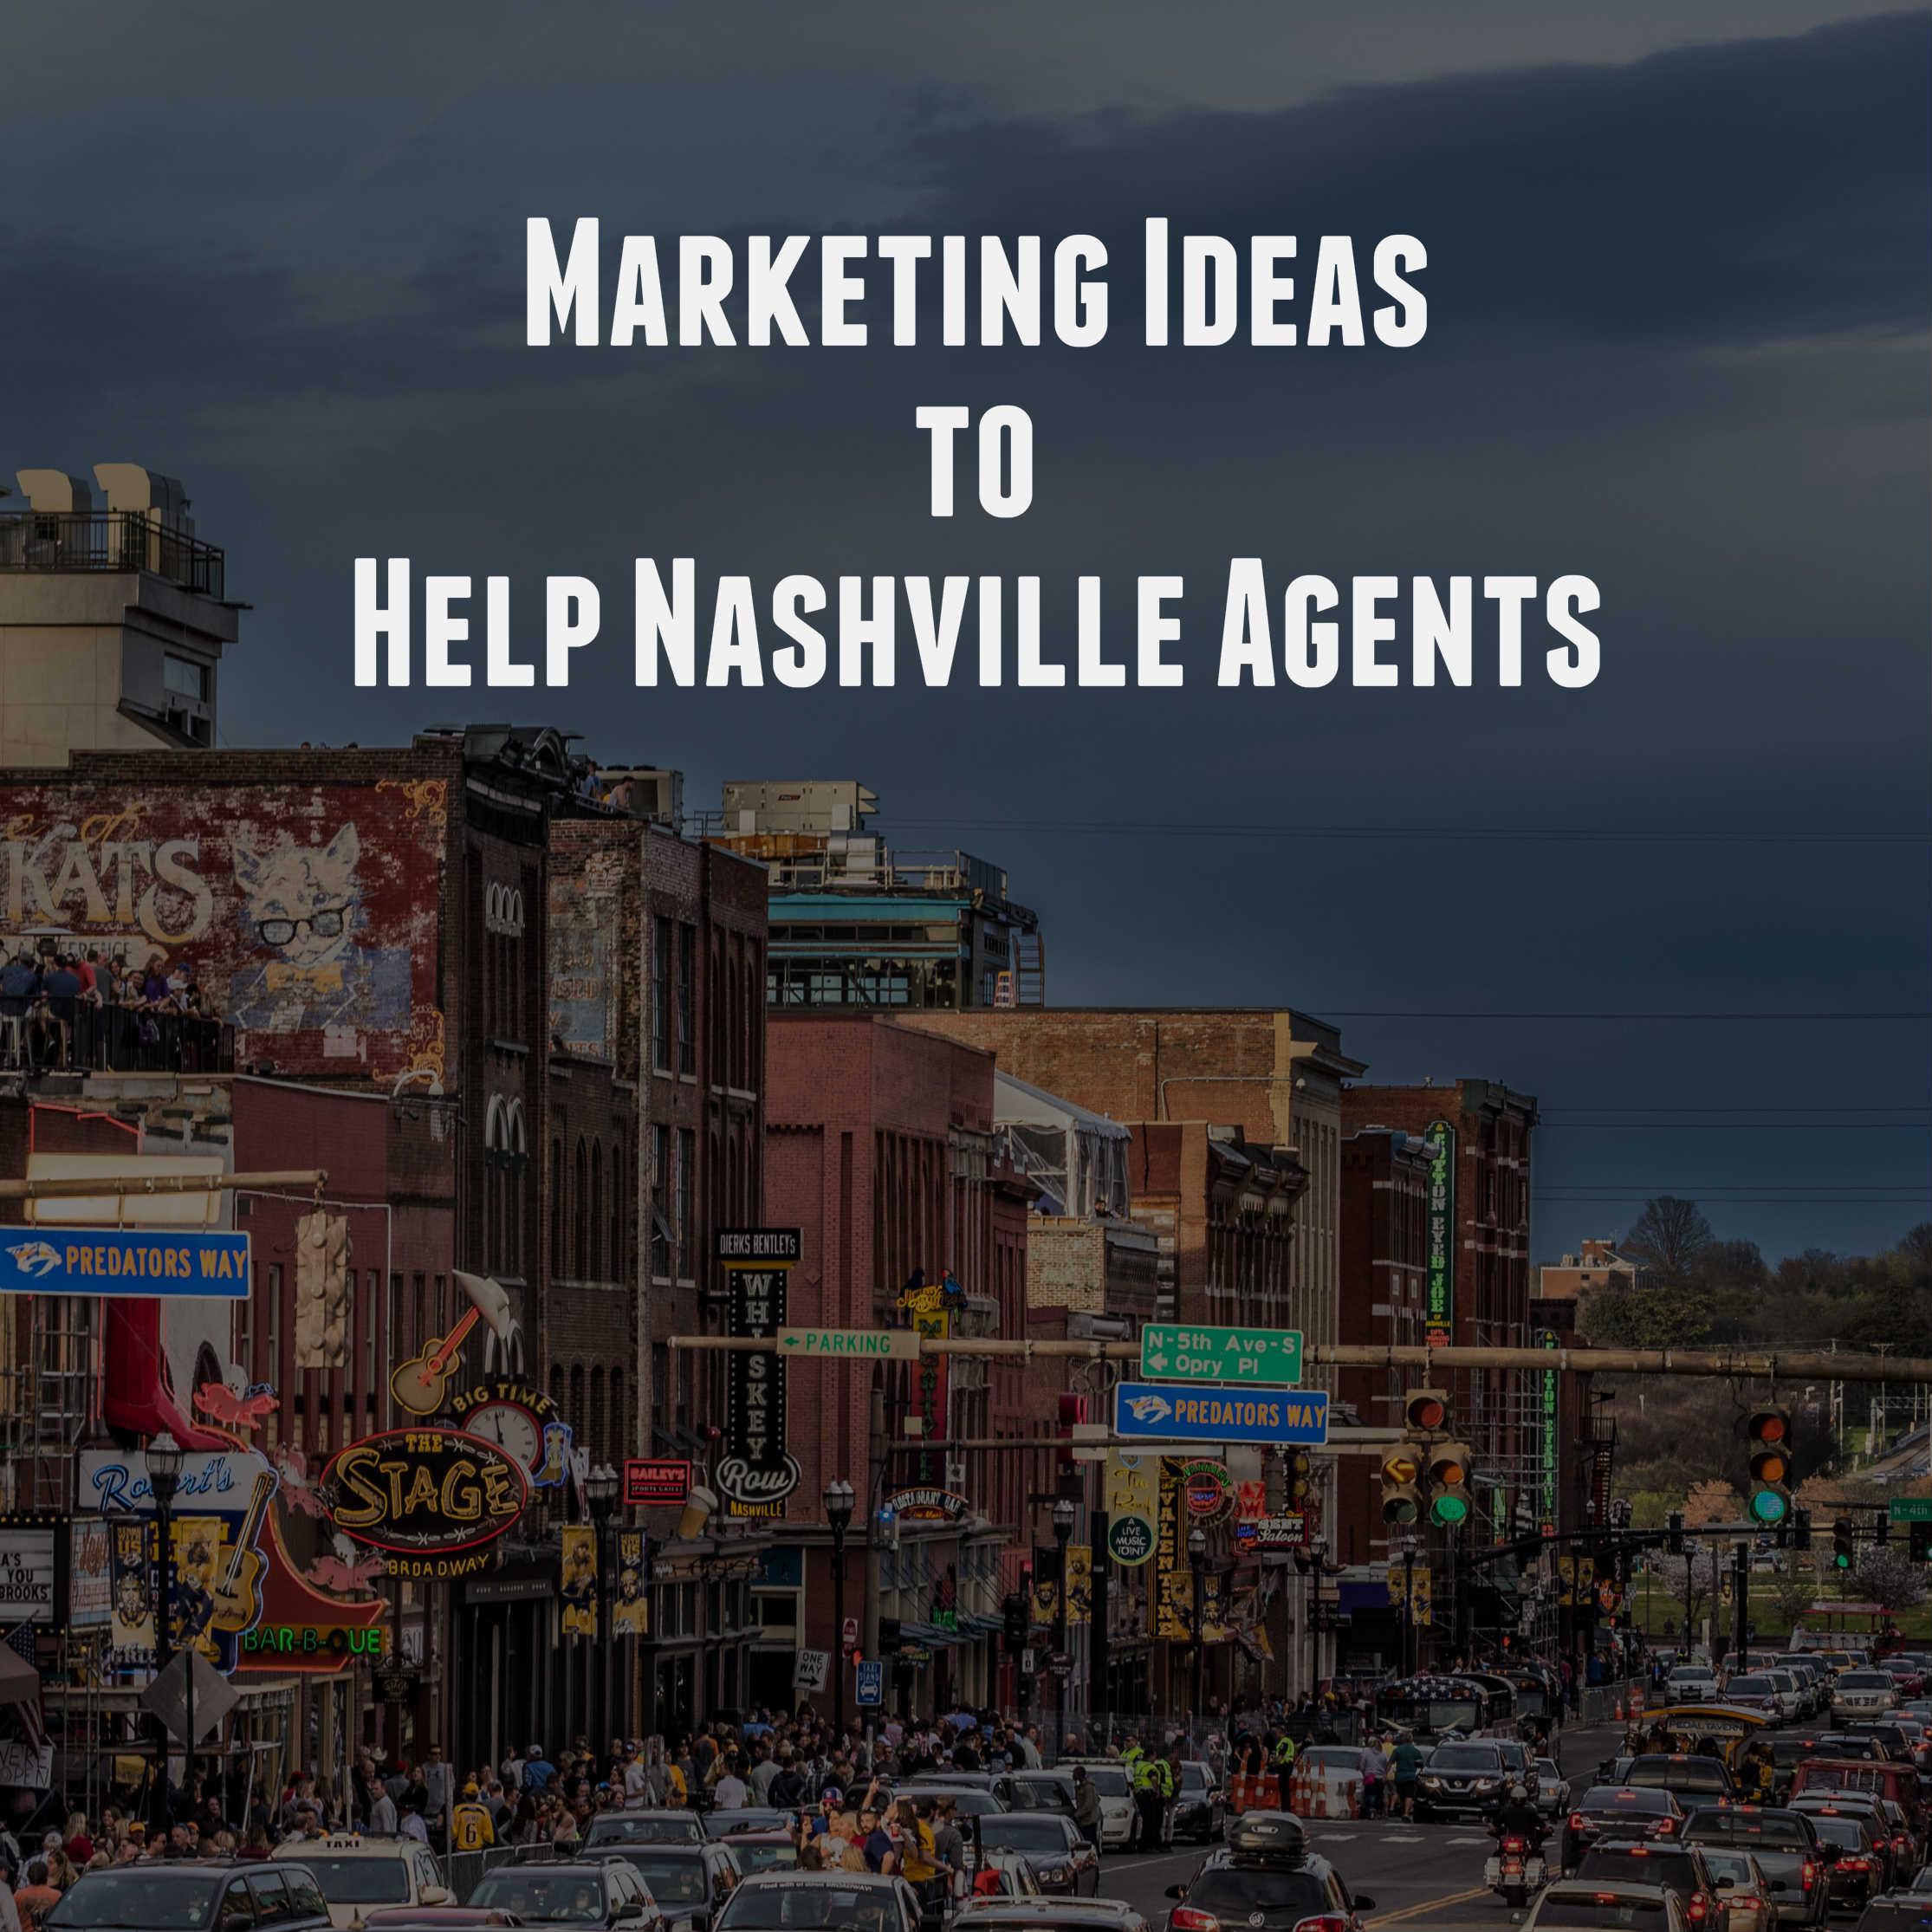 Marketing Ideas to Help Nashville Agents